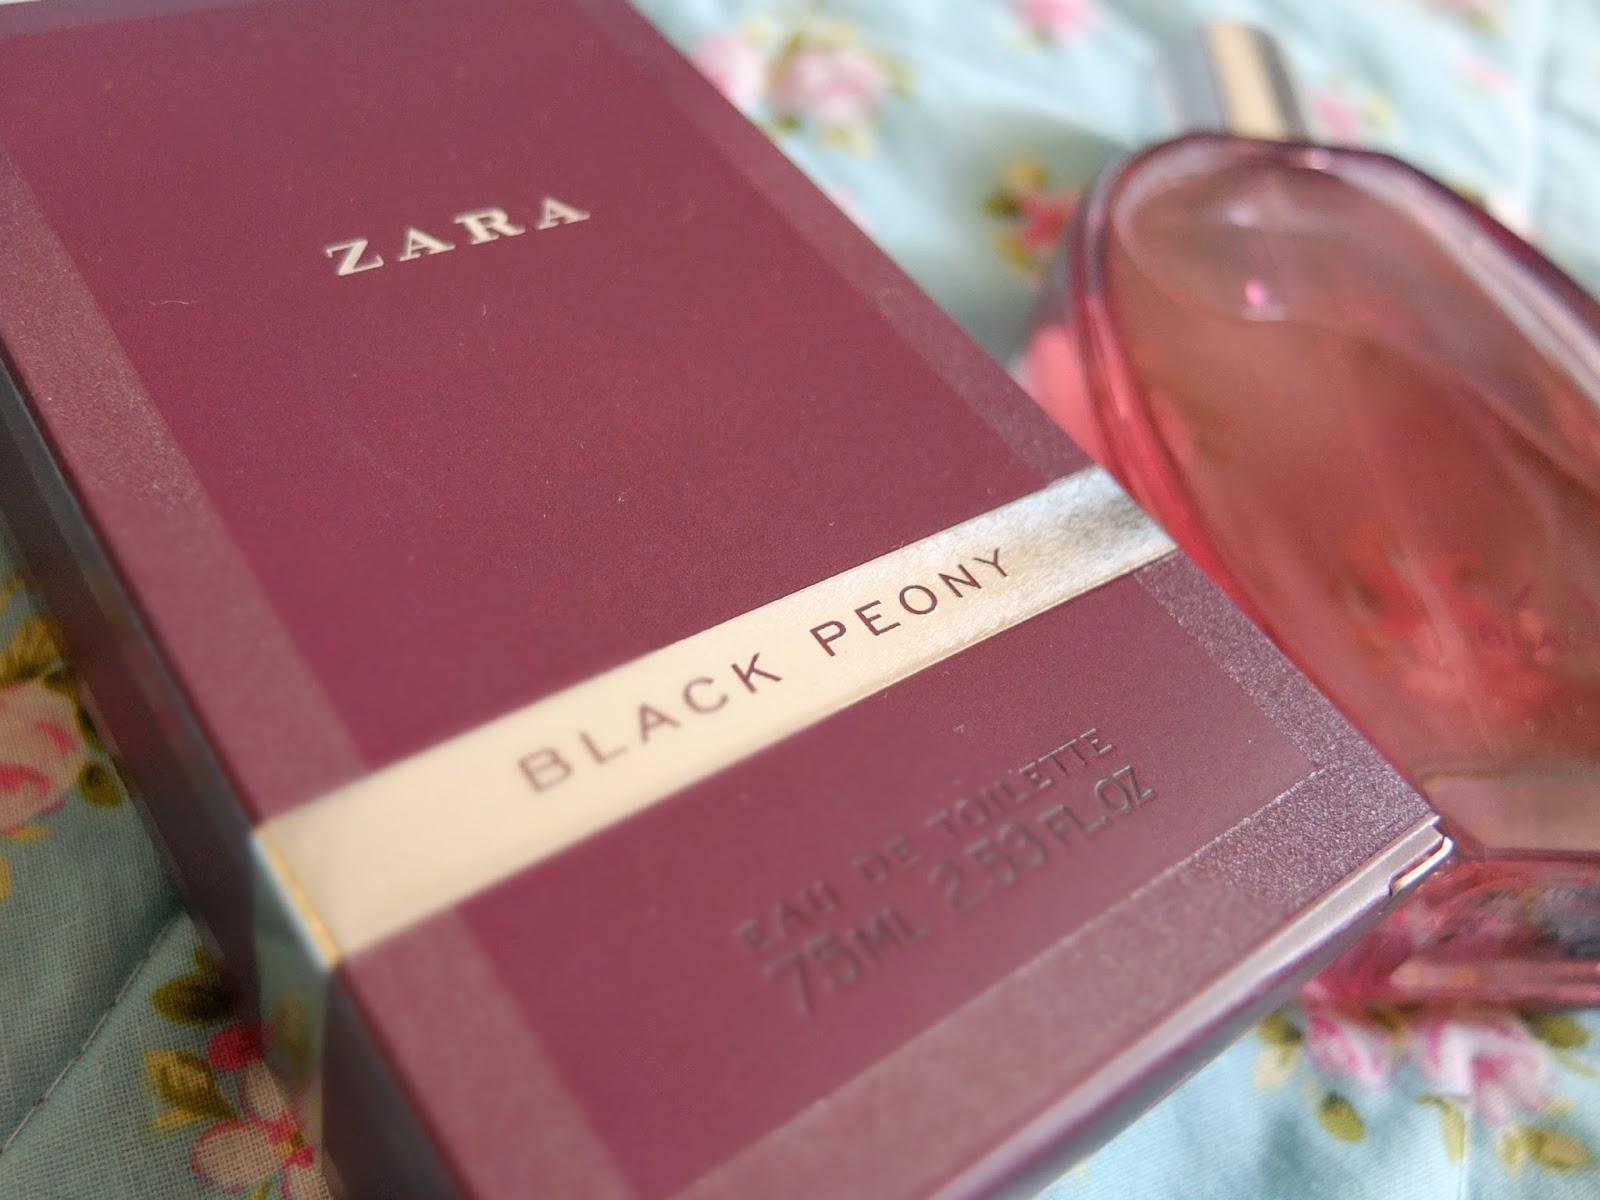 UK dupe of Viktor and Rolf Flowerbomb perfume - Black Peony from Zara on UK beauty blog.